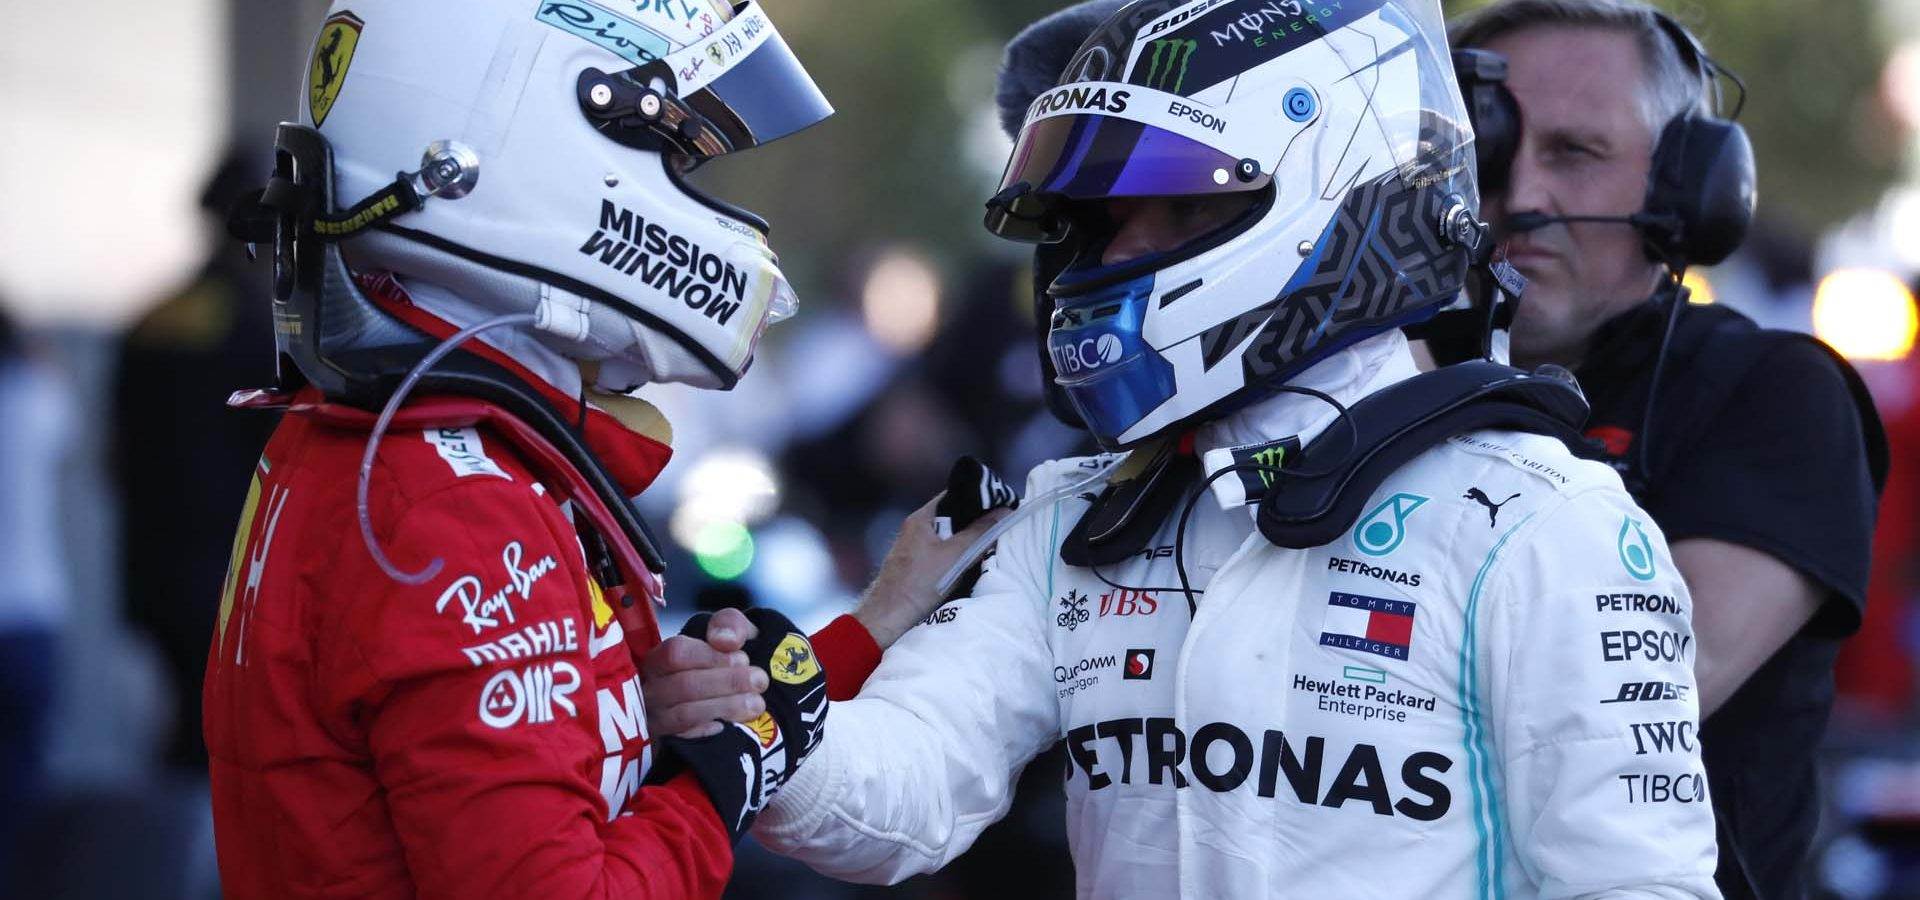 Formula One F1 - Japanese Grand Prix - Suzuka Circuit, Suzuka, Japan - October 13, 2019. Mercedes' Valtteri Bottas shakes hands with Ferrari's Sebastian Vettel after winning the race. REUTERS/Issei Kato